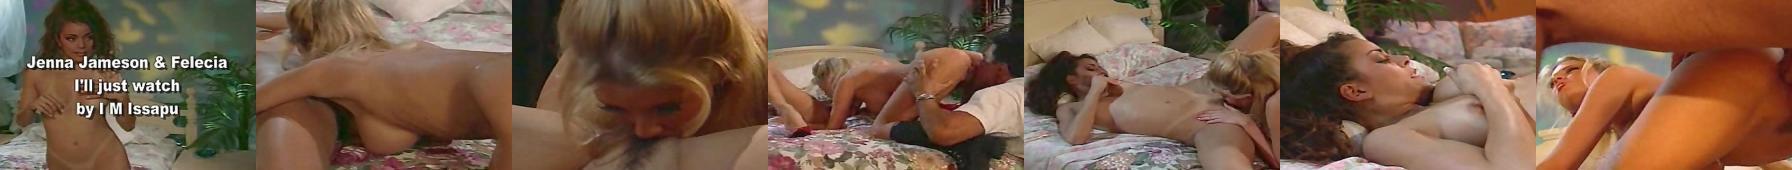 Jenna Jameson i Felicia Stripper trójkąt